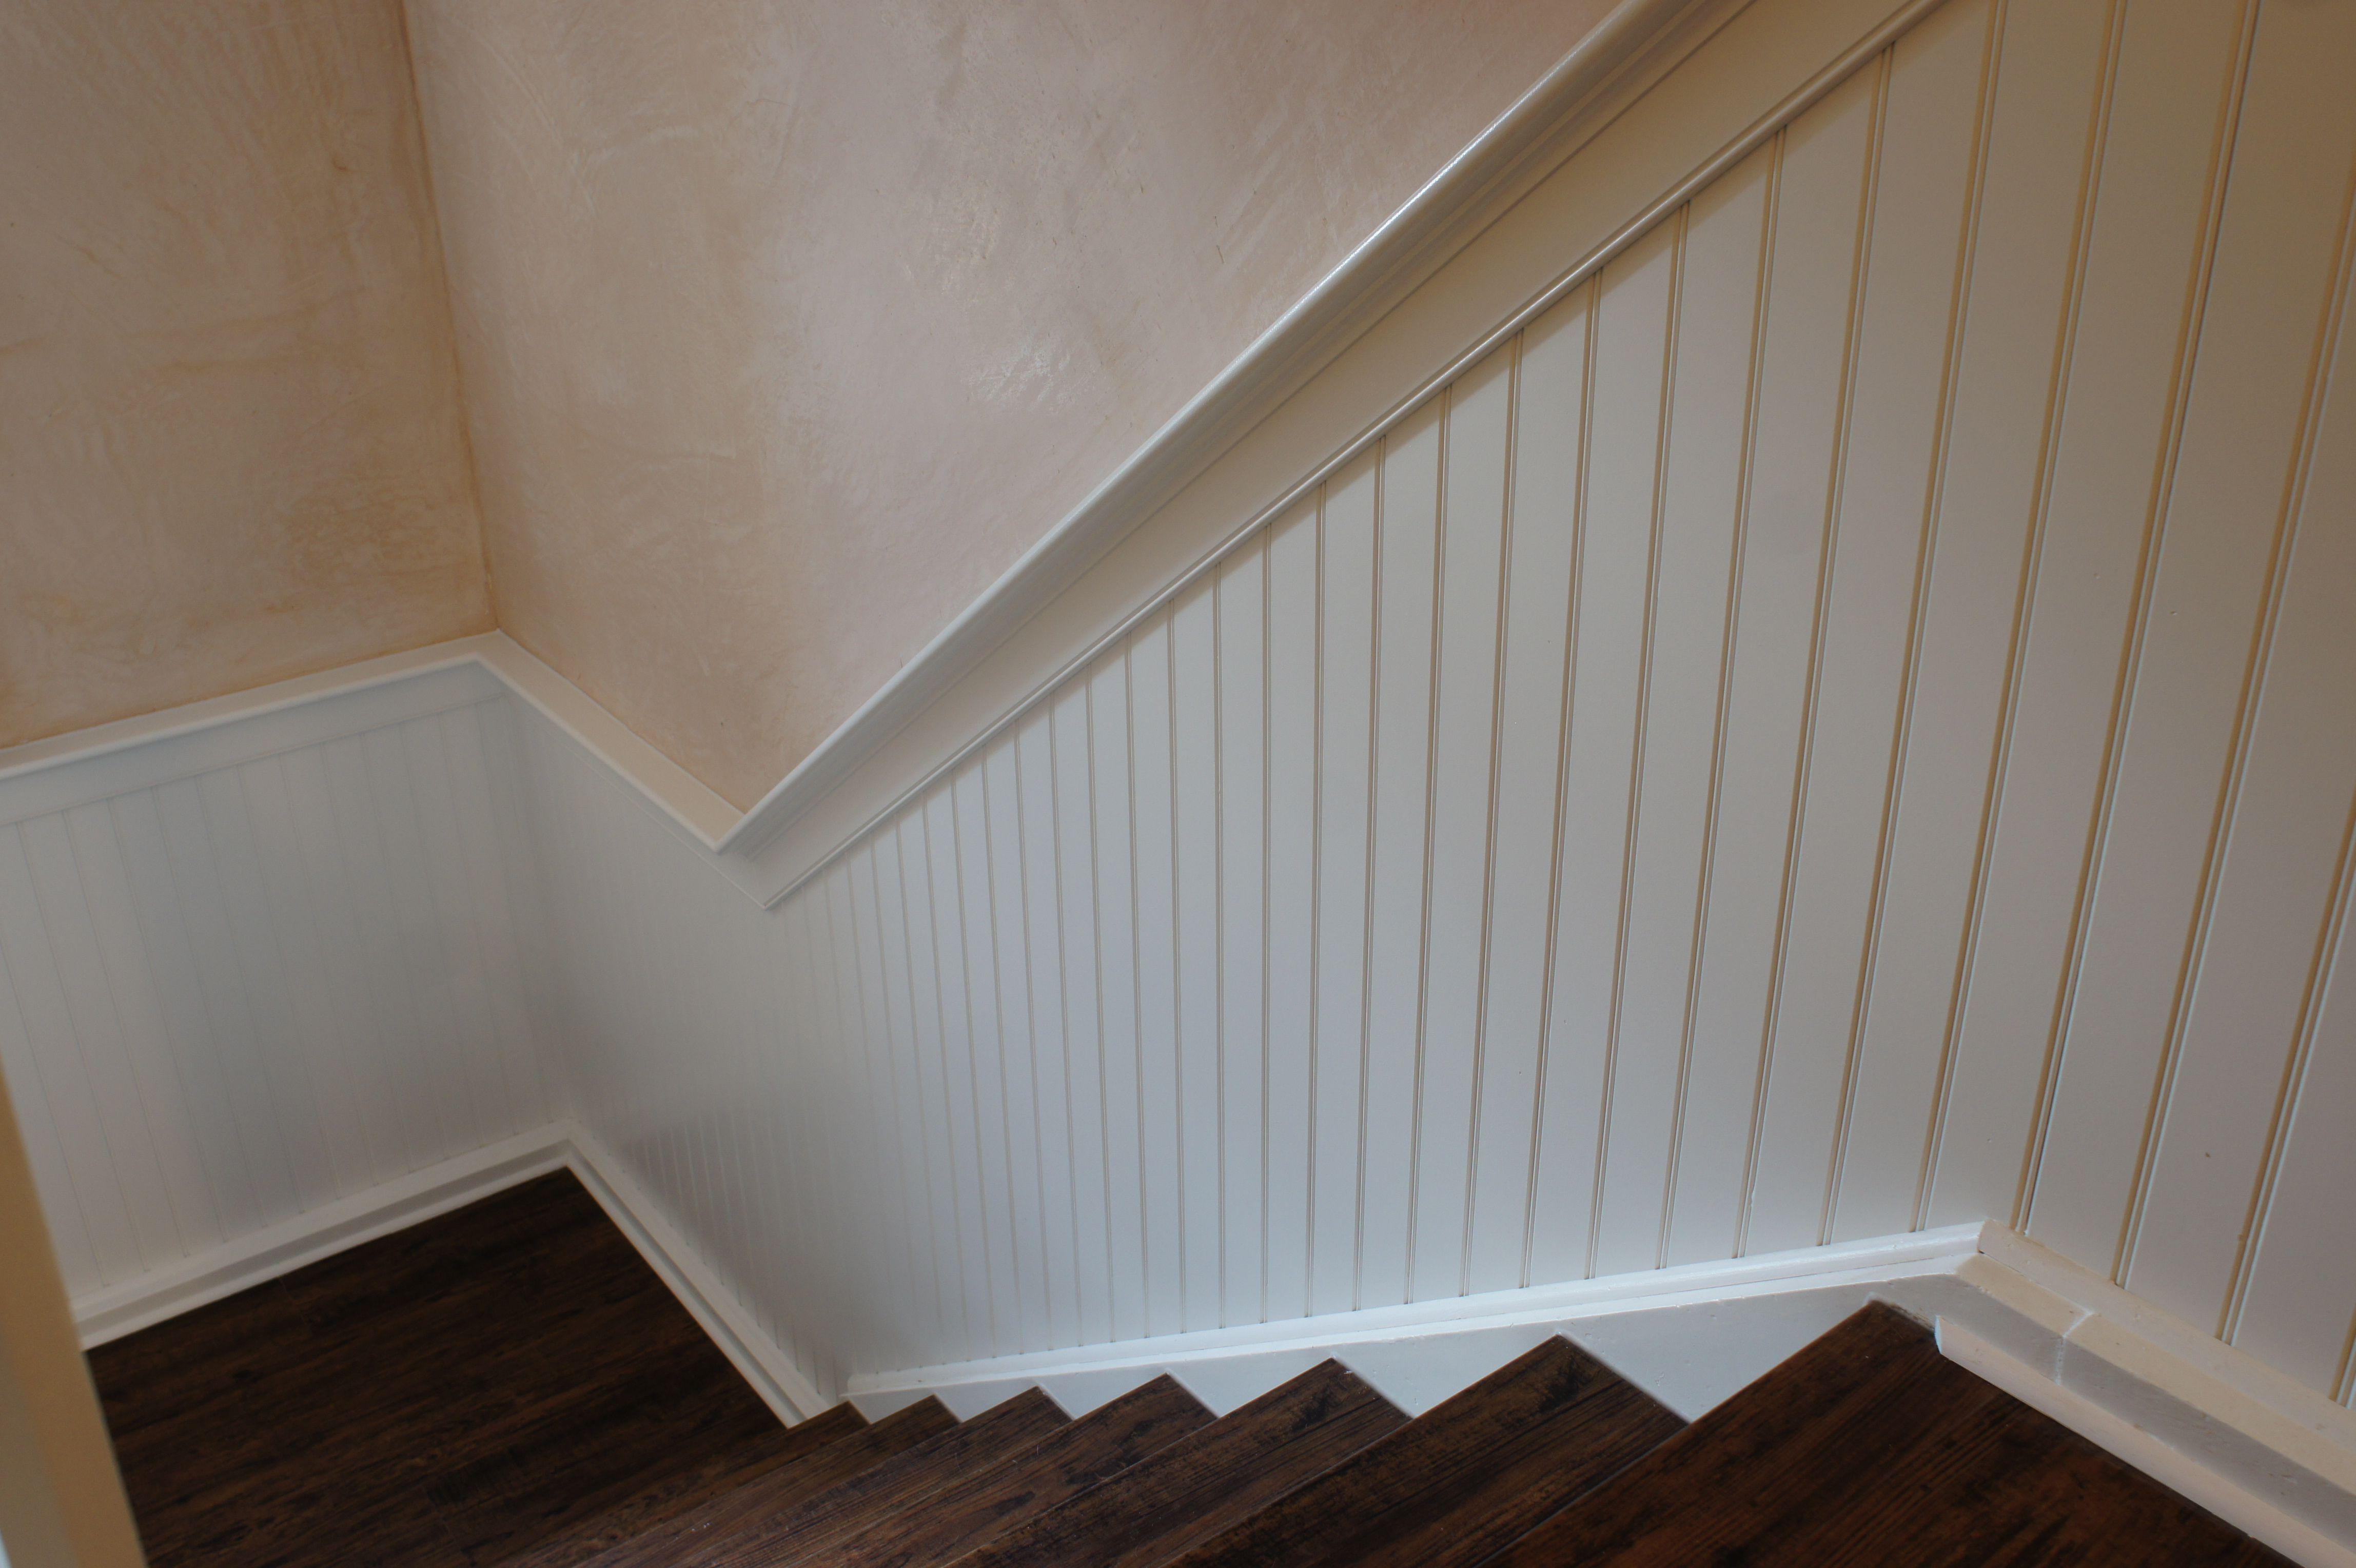 Beadboard De Home Wandvertafelung Treppenaufgang Holzpaneele